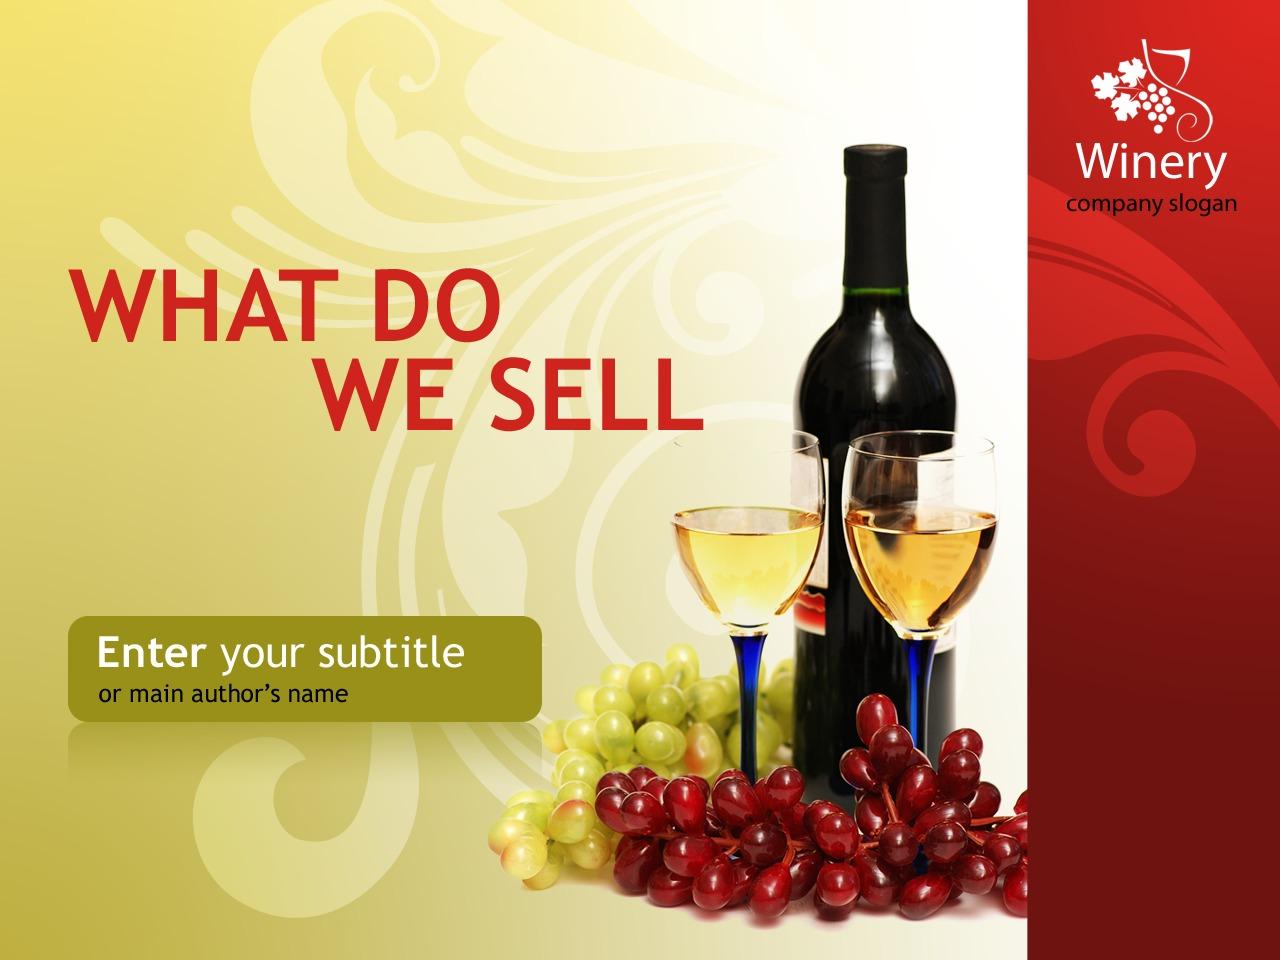 Szablon PowerPoint #31989 na temat: winiarnia